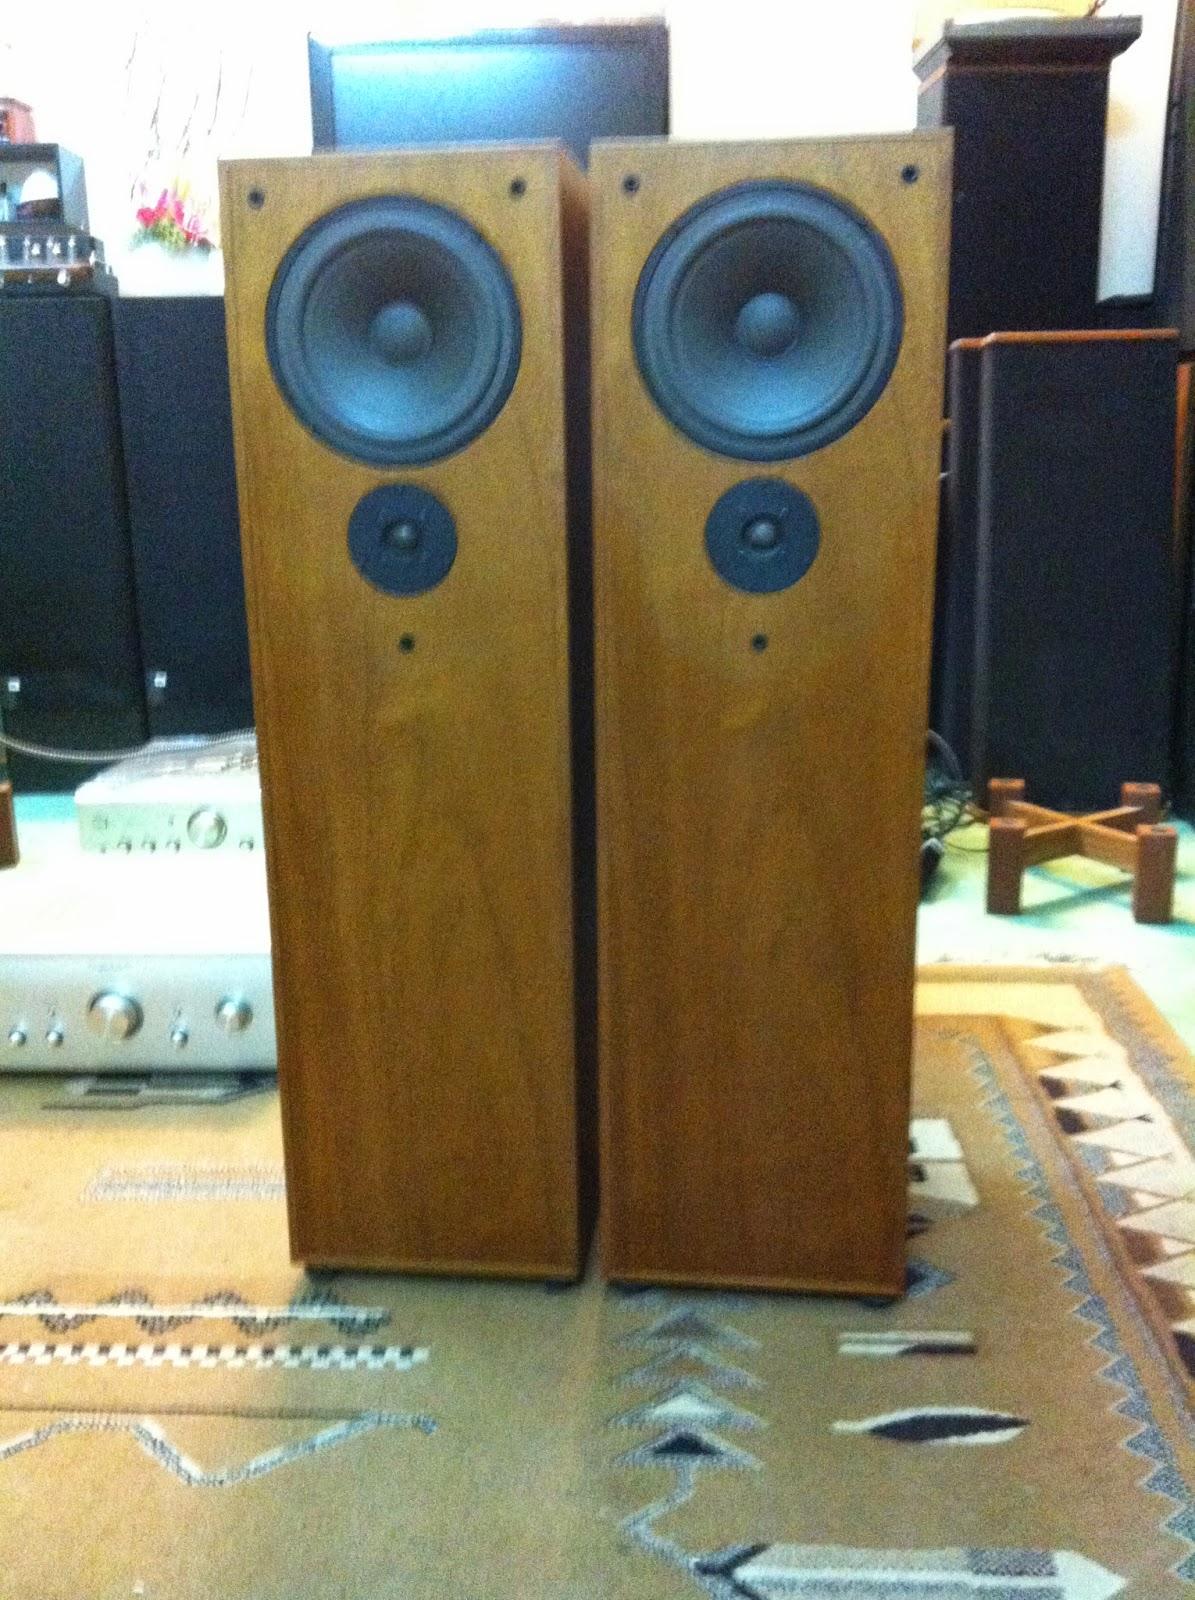 Mặt trước loa  Audio Note AZ-Three